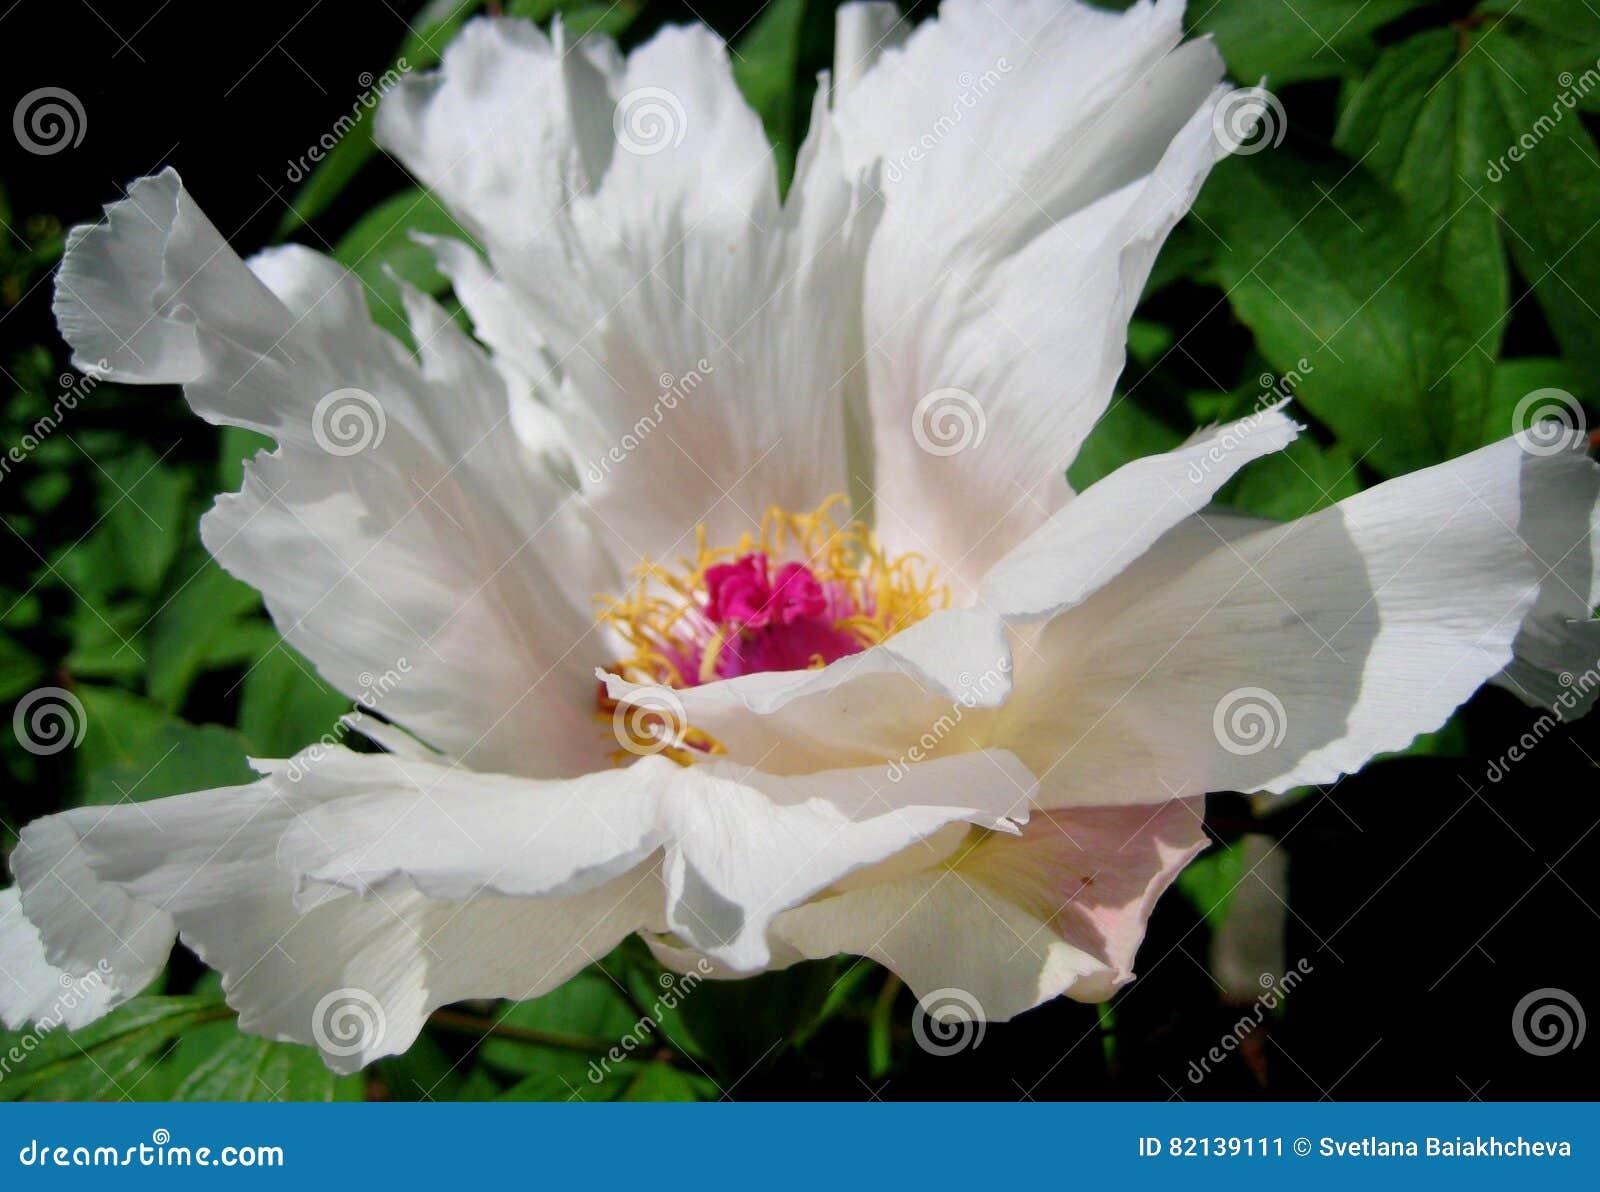 Macro photo of beautiful white Terry flower Paeónia